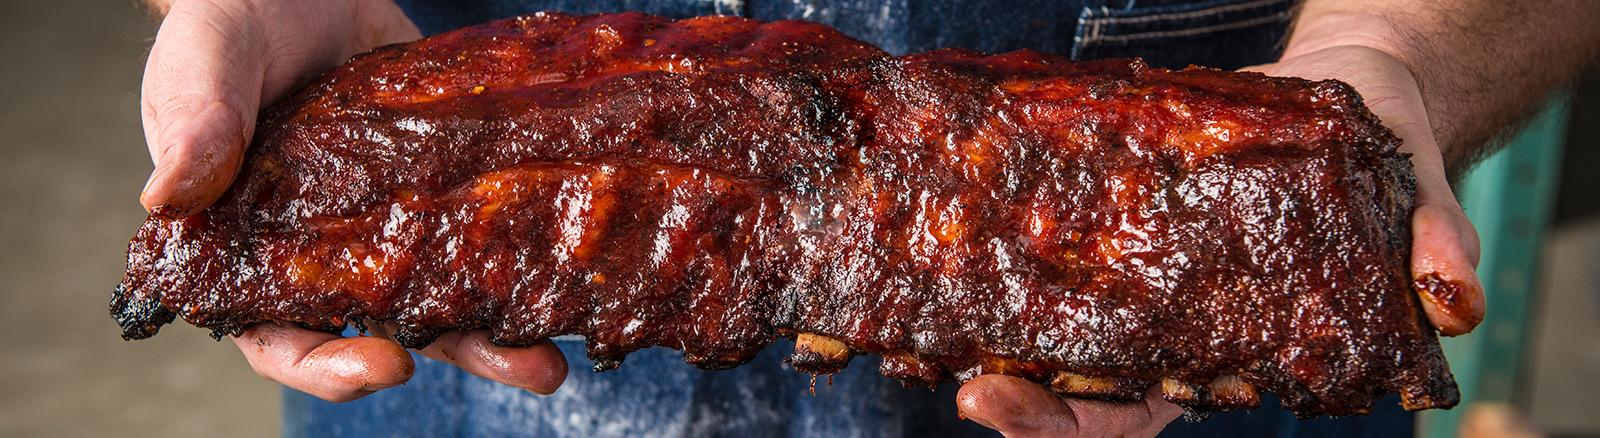 Smoked Spice Rub Ribs Traeger Wood Pellet Grills - BBQ ...